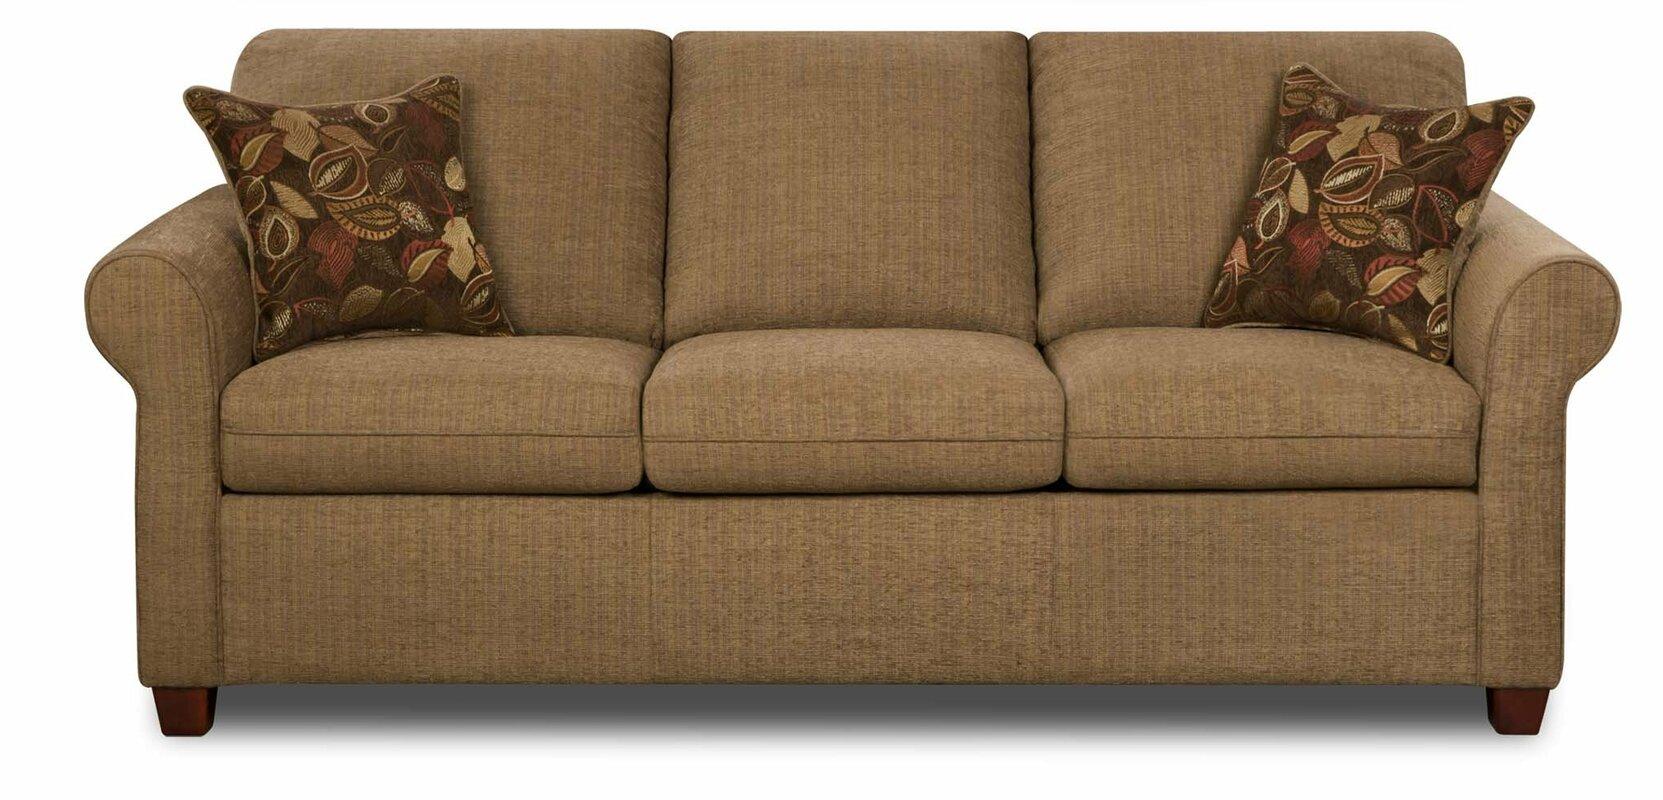 Simmons Upholstery Crittendon Queen Hide A Bed Sleeper Sofa Reviews Birch Lane